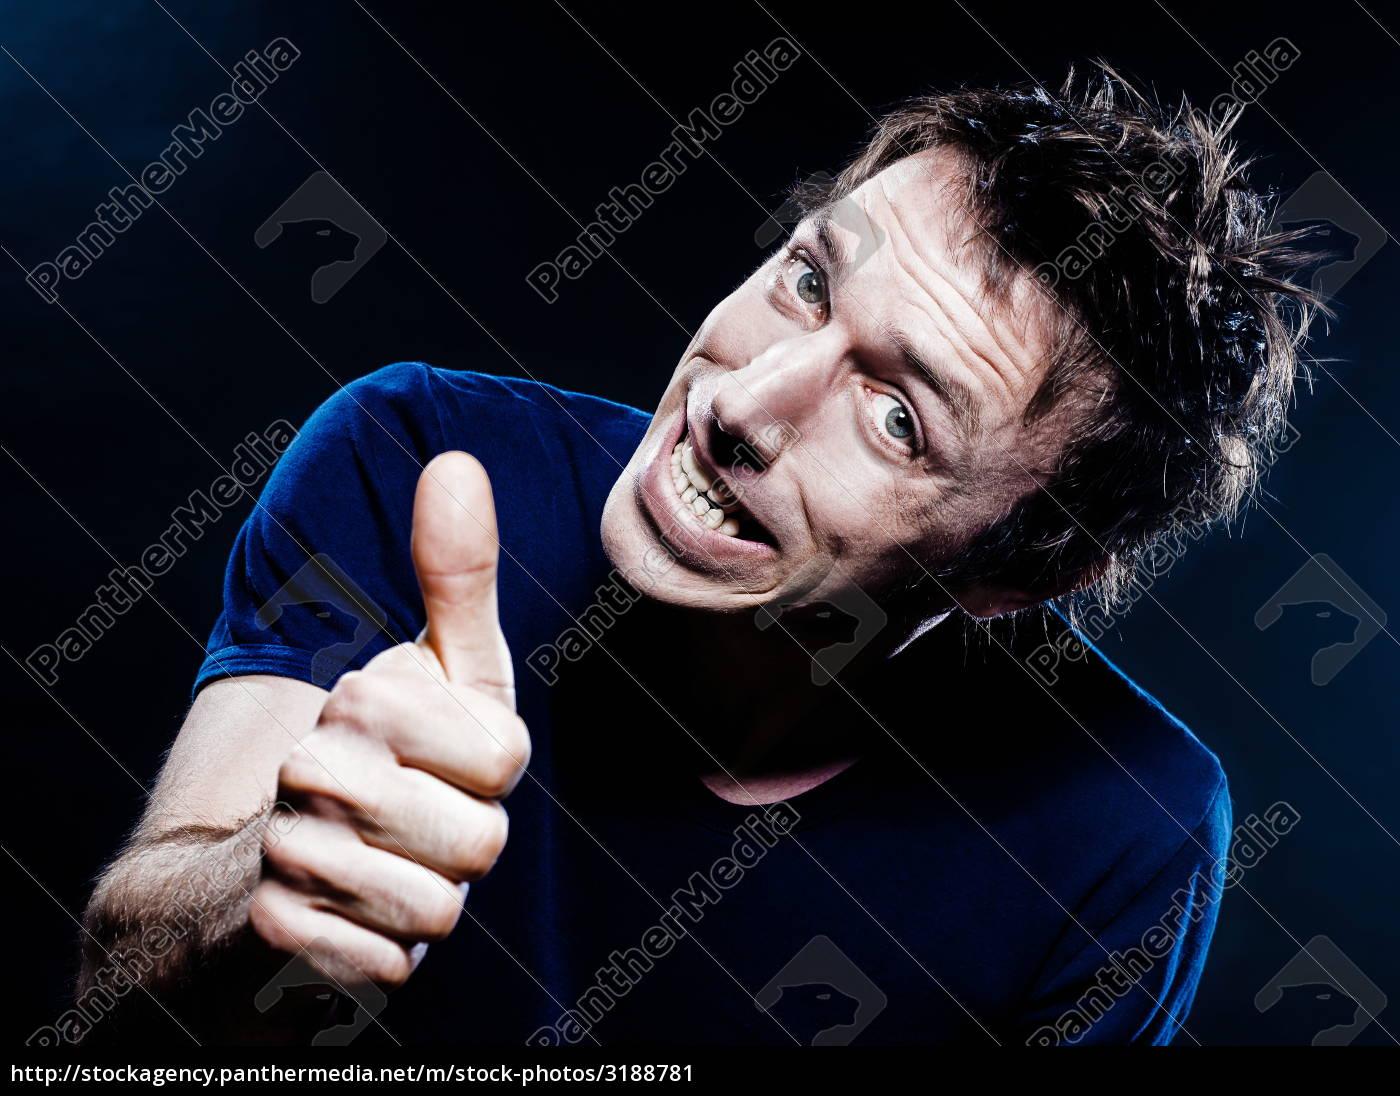 funny, man, portrait, phoning - 3188781